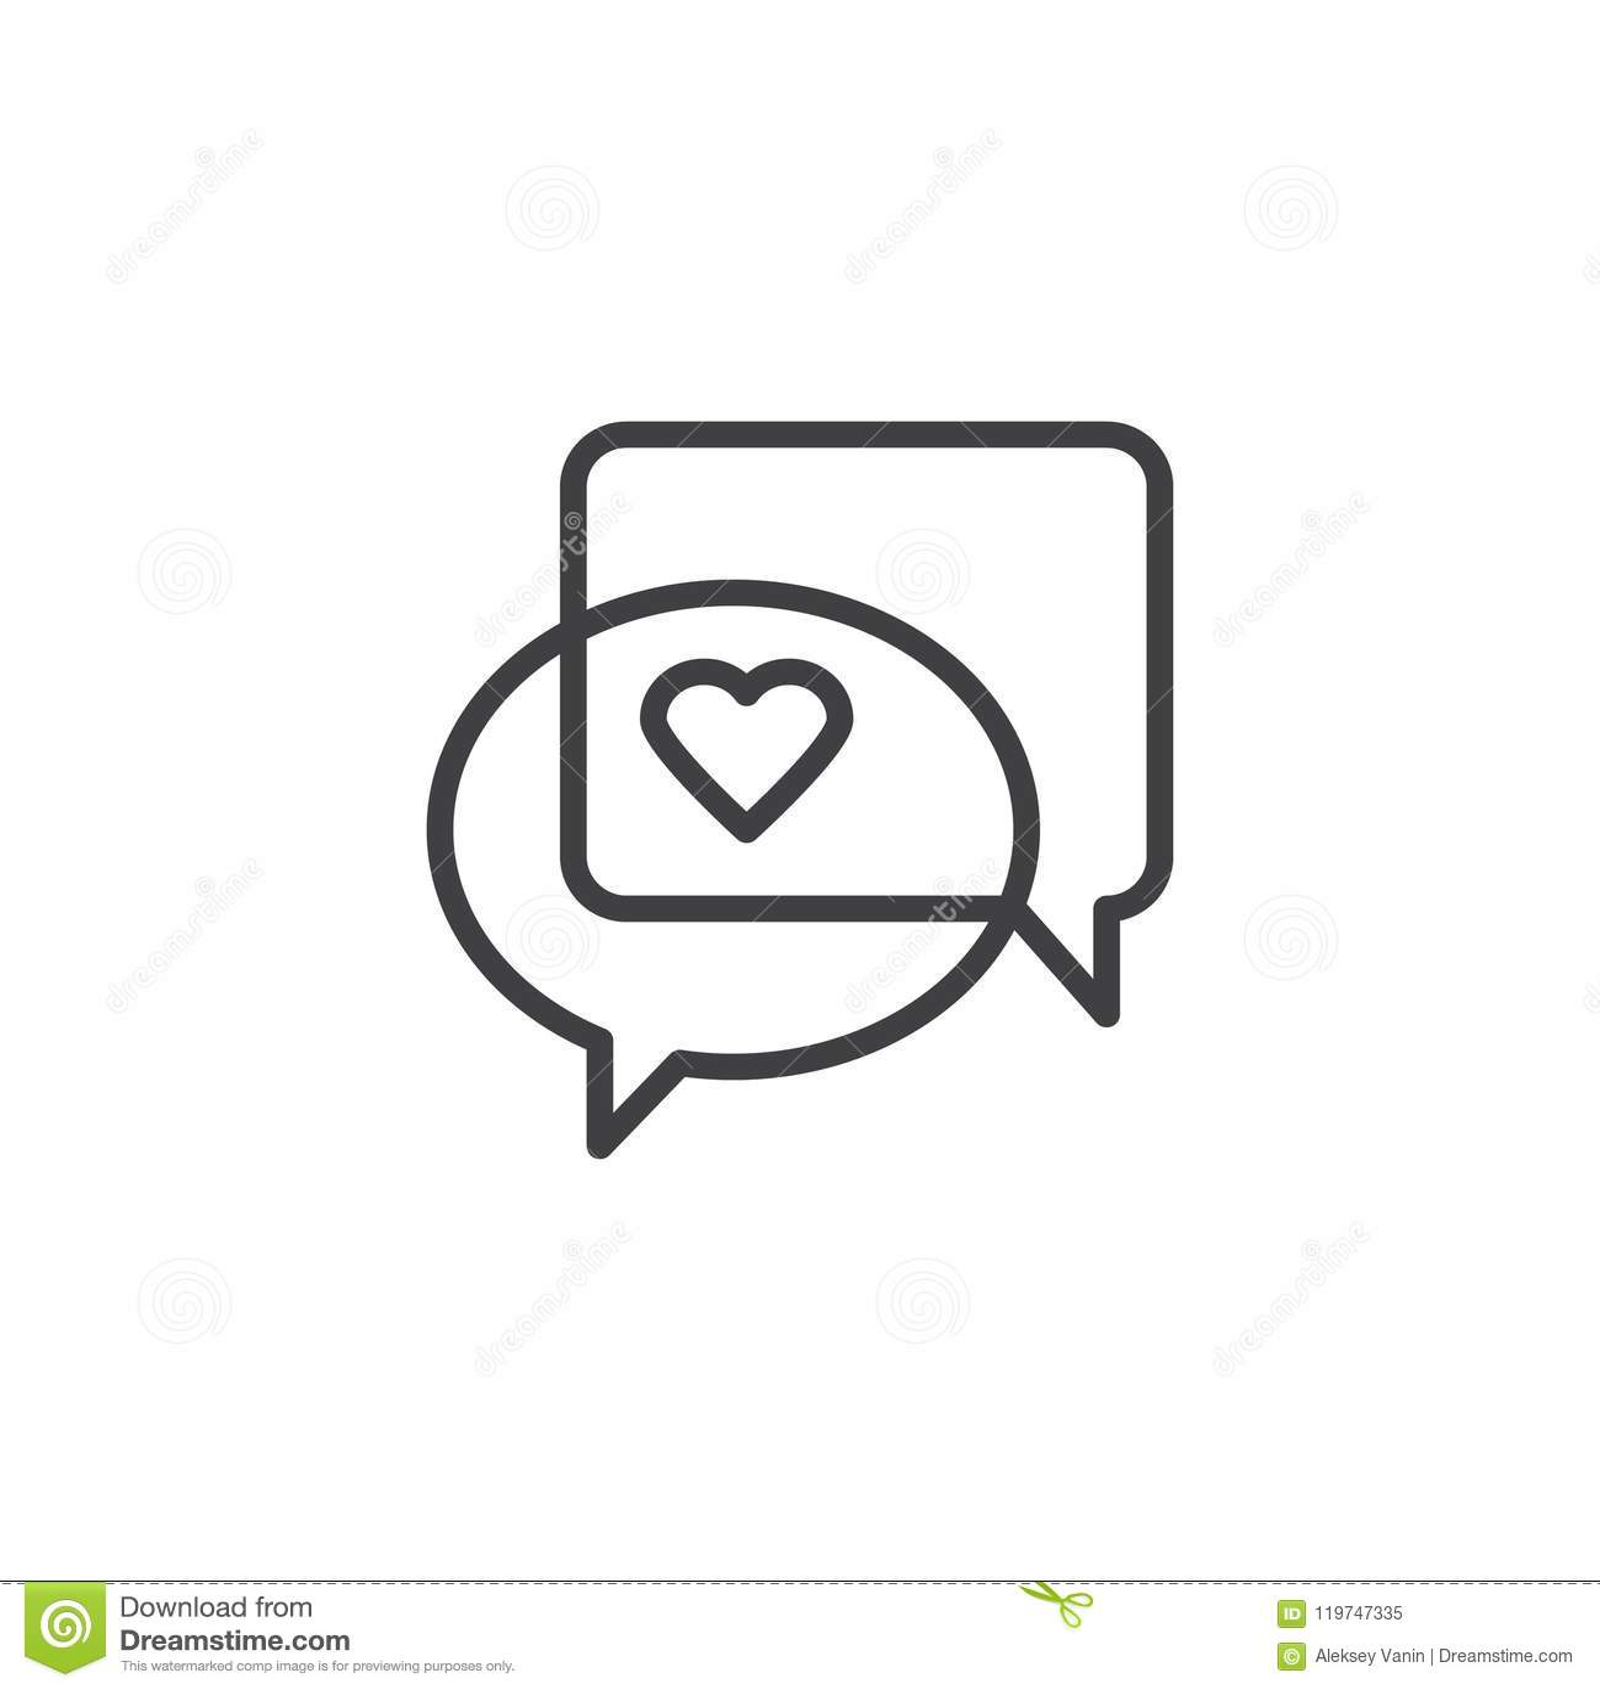 love heart speech bubble outline icon stock vector illustration